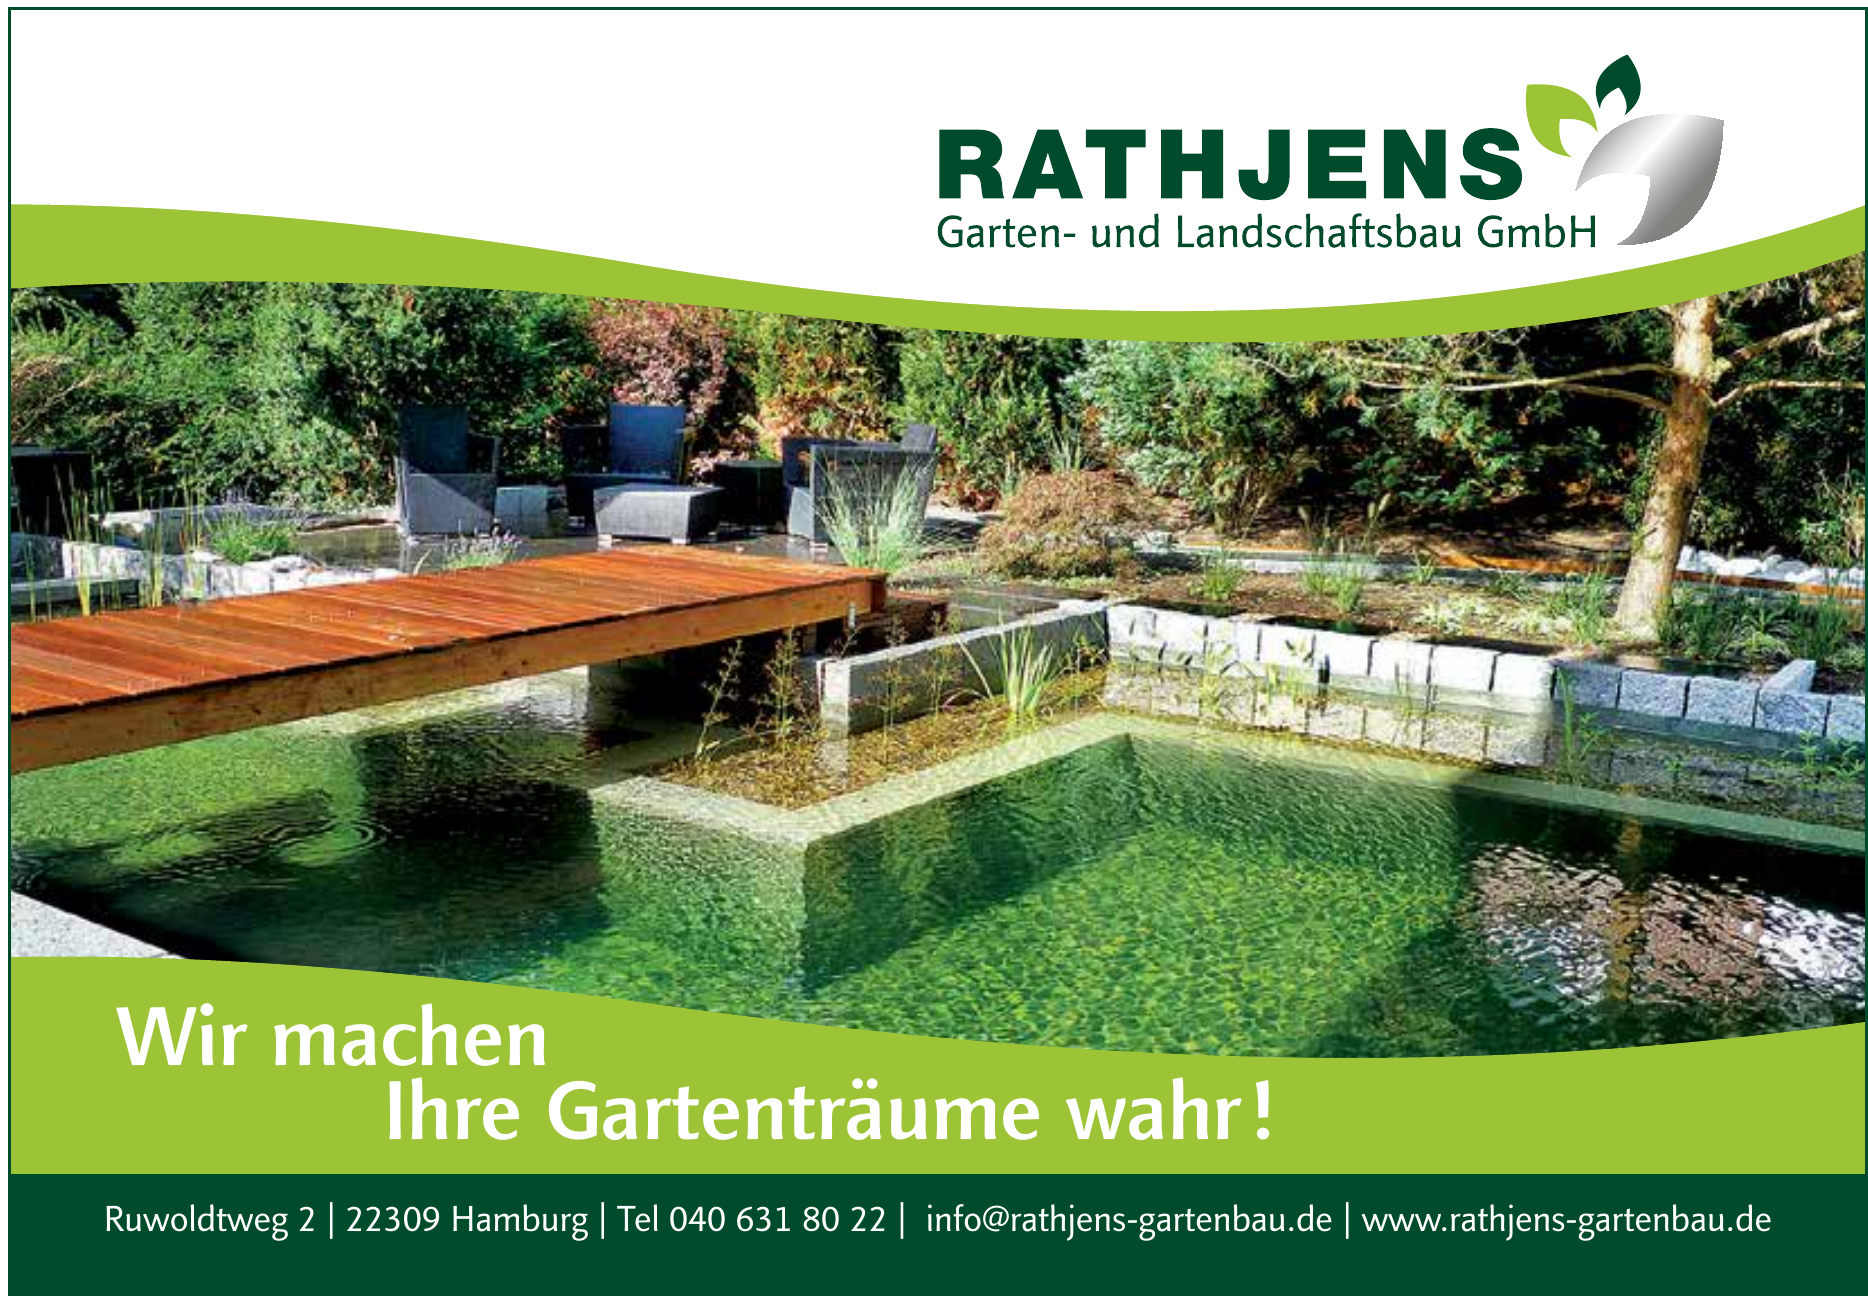 Rathjens Gartenbau GmbH